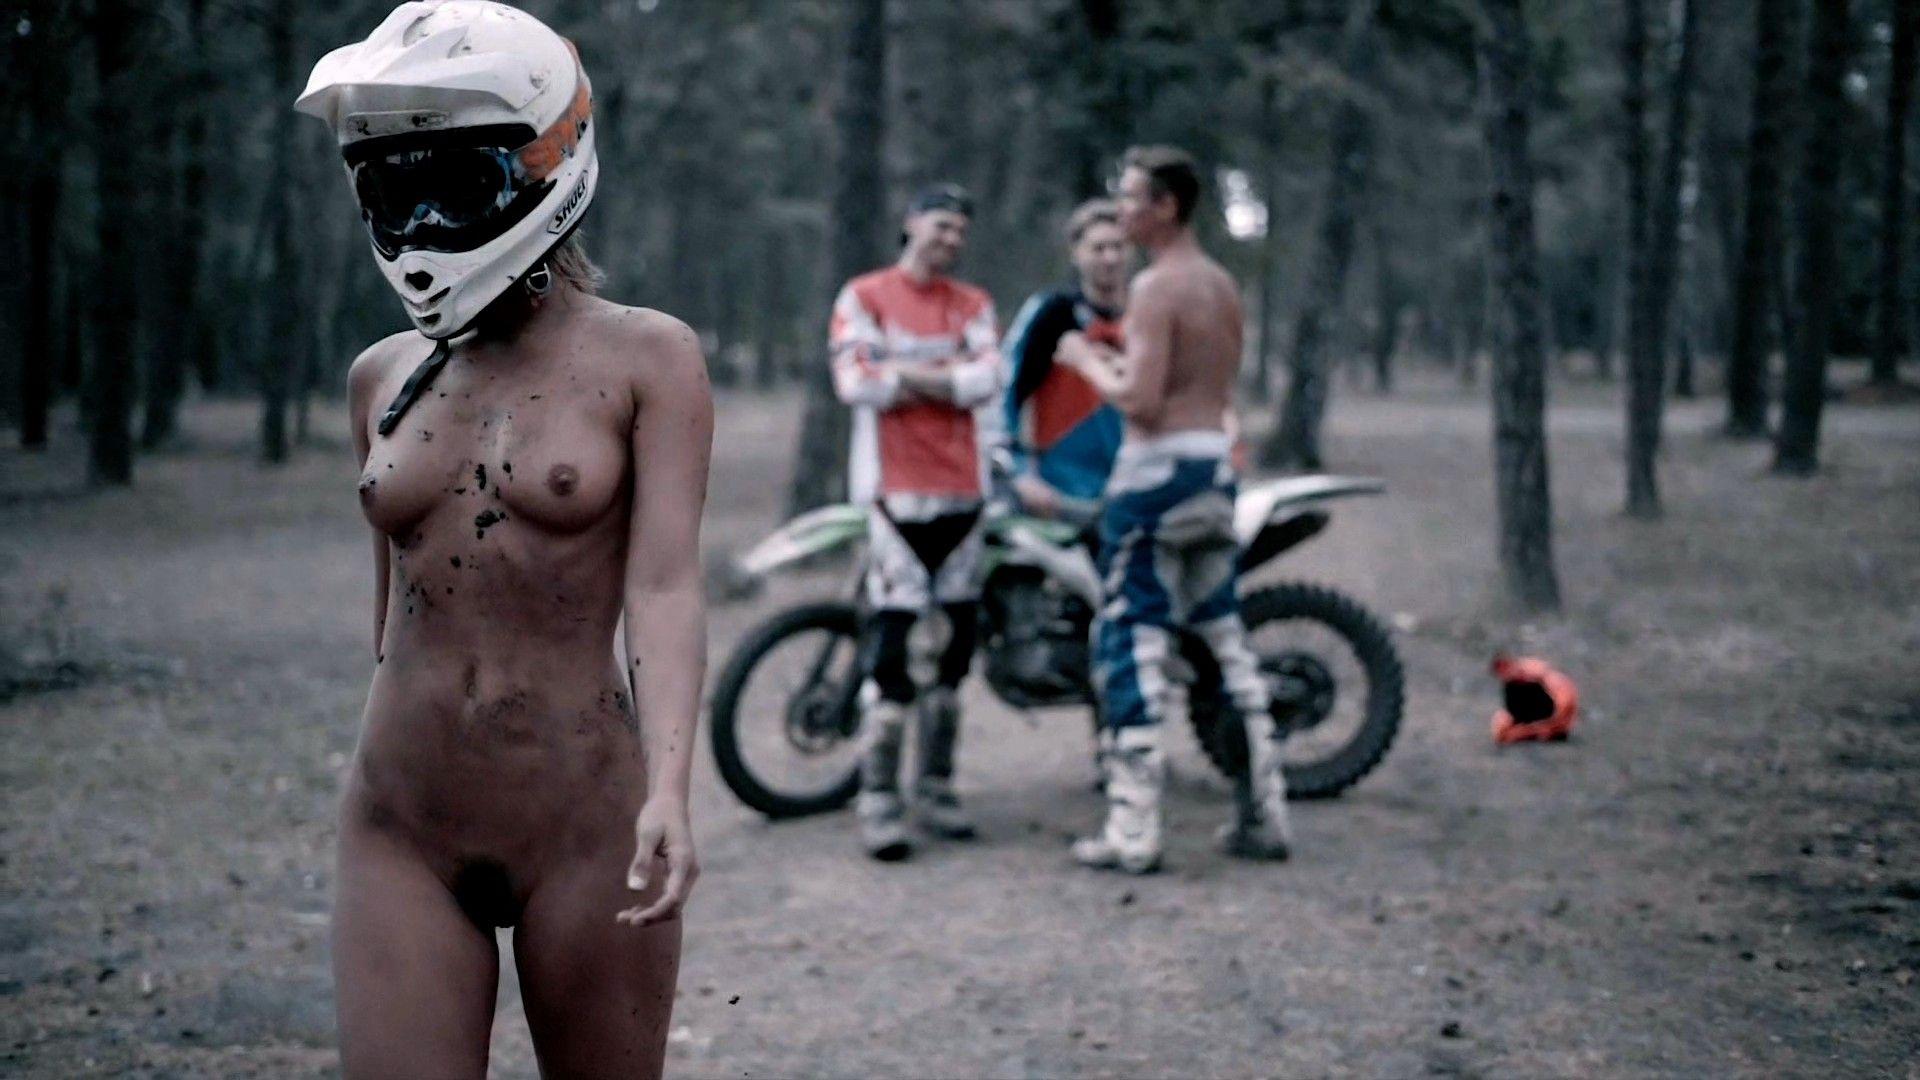 marisa-papen-nude-bts-thefappeningBlog-10.jpg